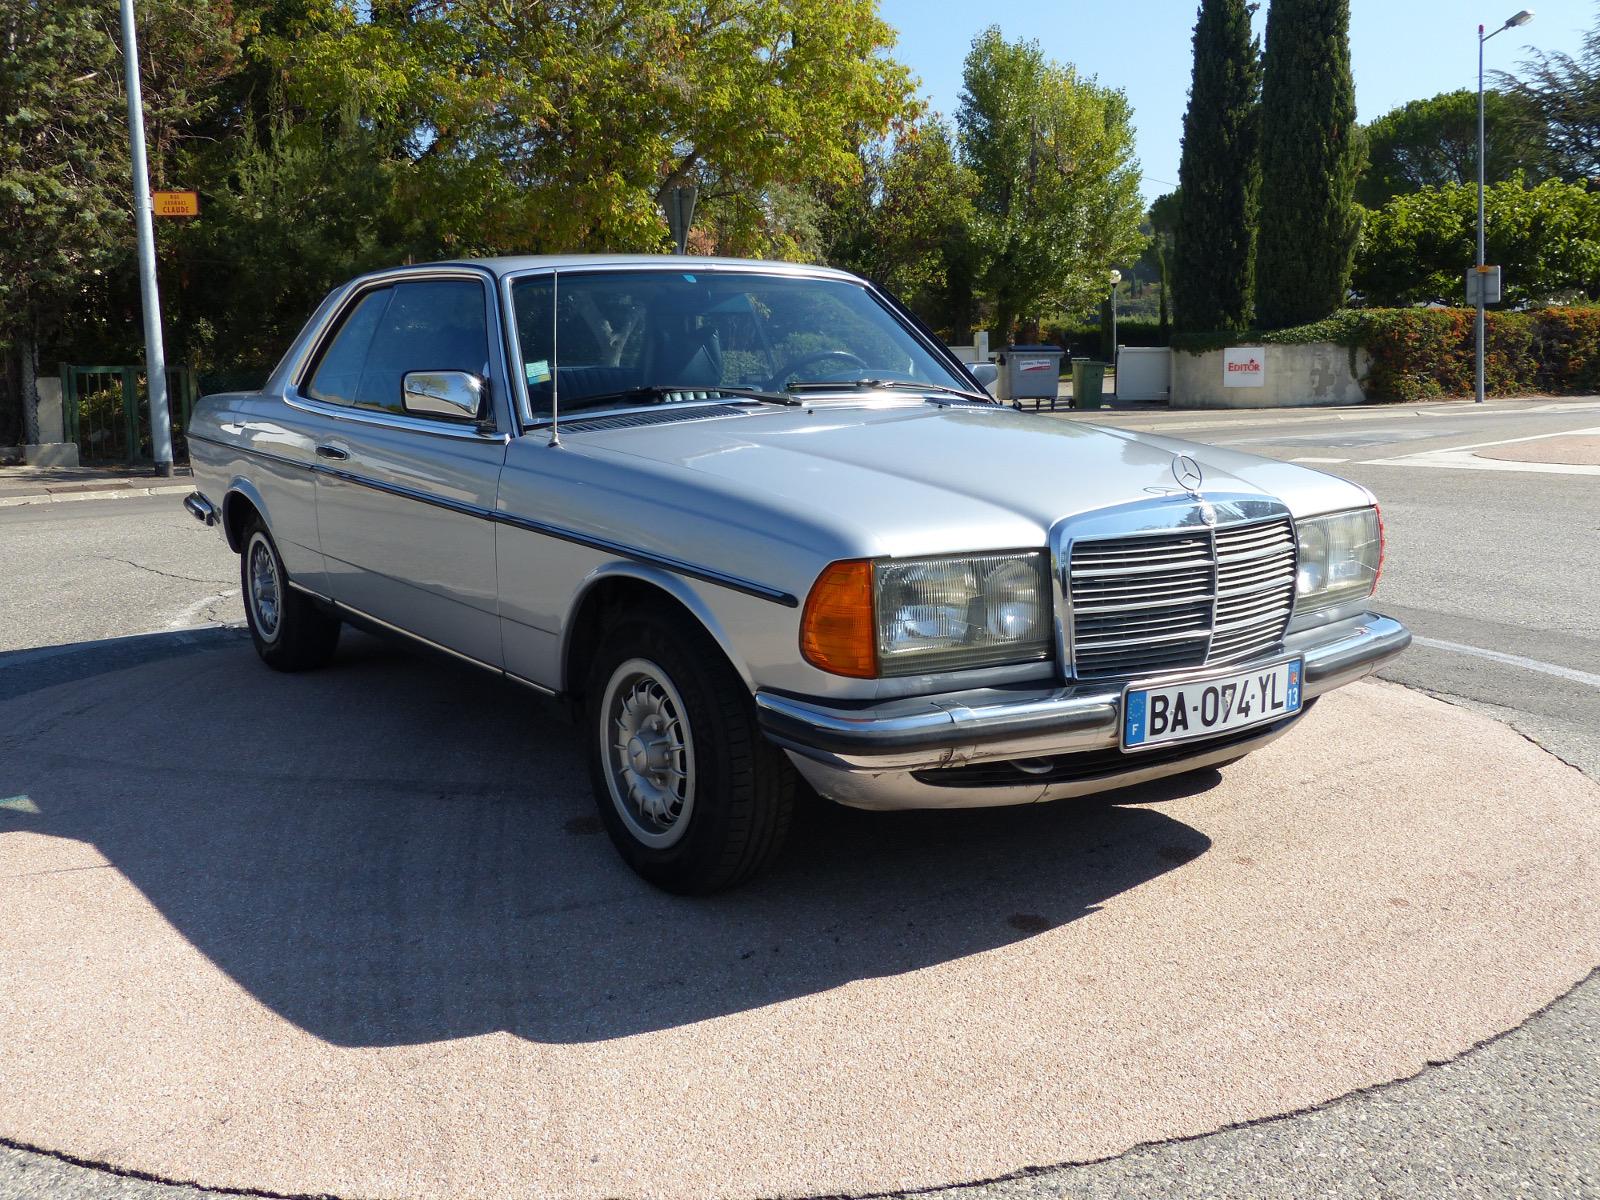 Mercedes benz 230 les annonces collection for Mercedes benz collection